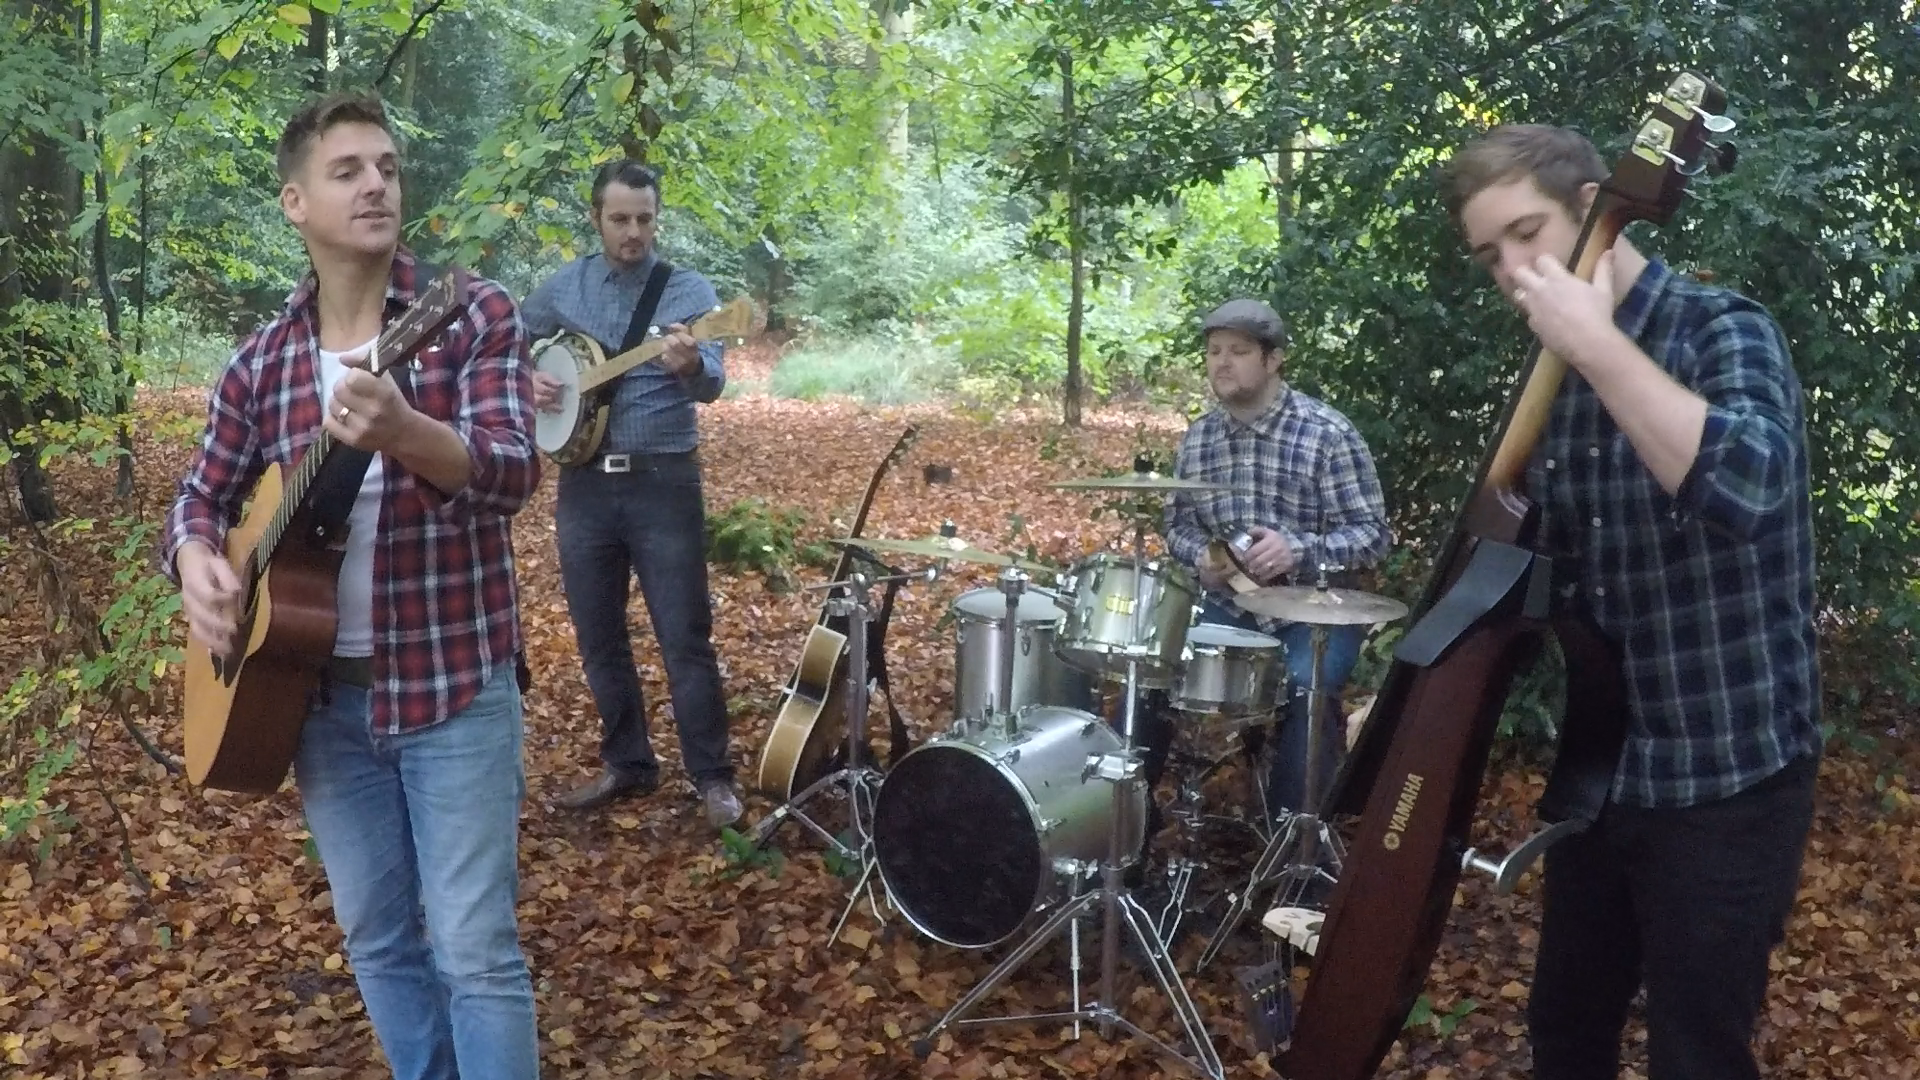 Indie folk rock band